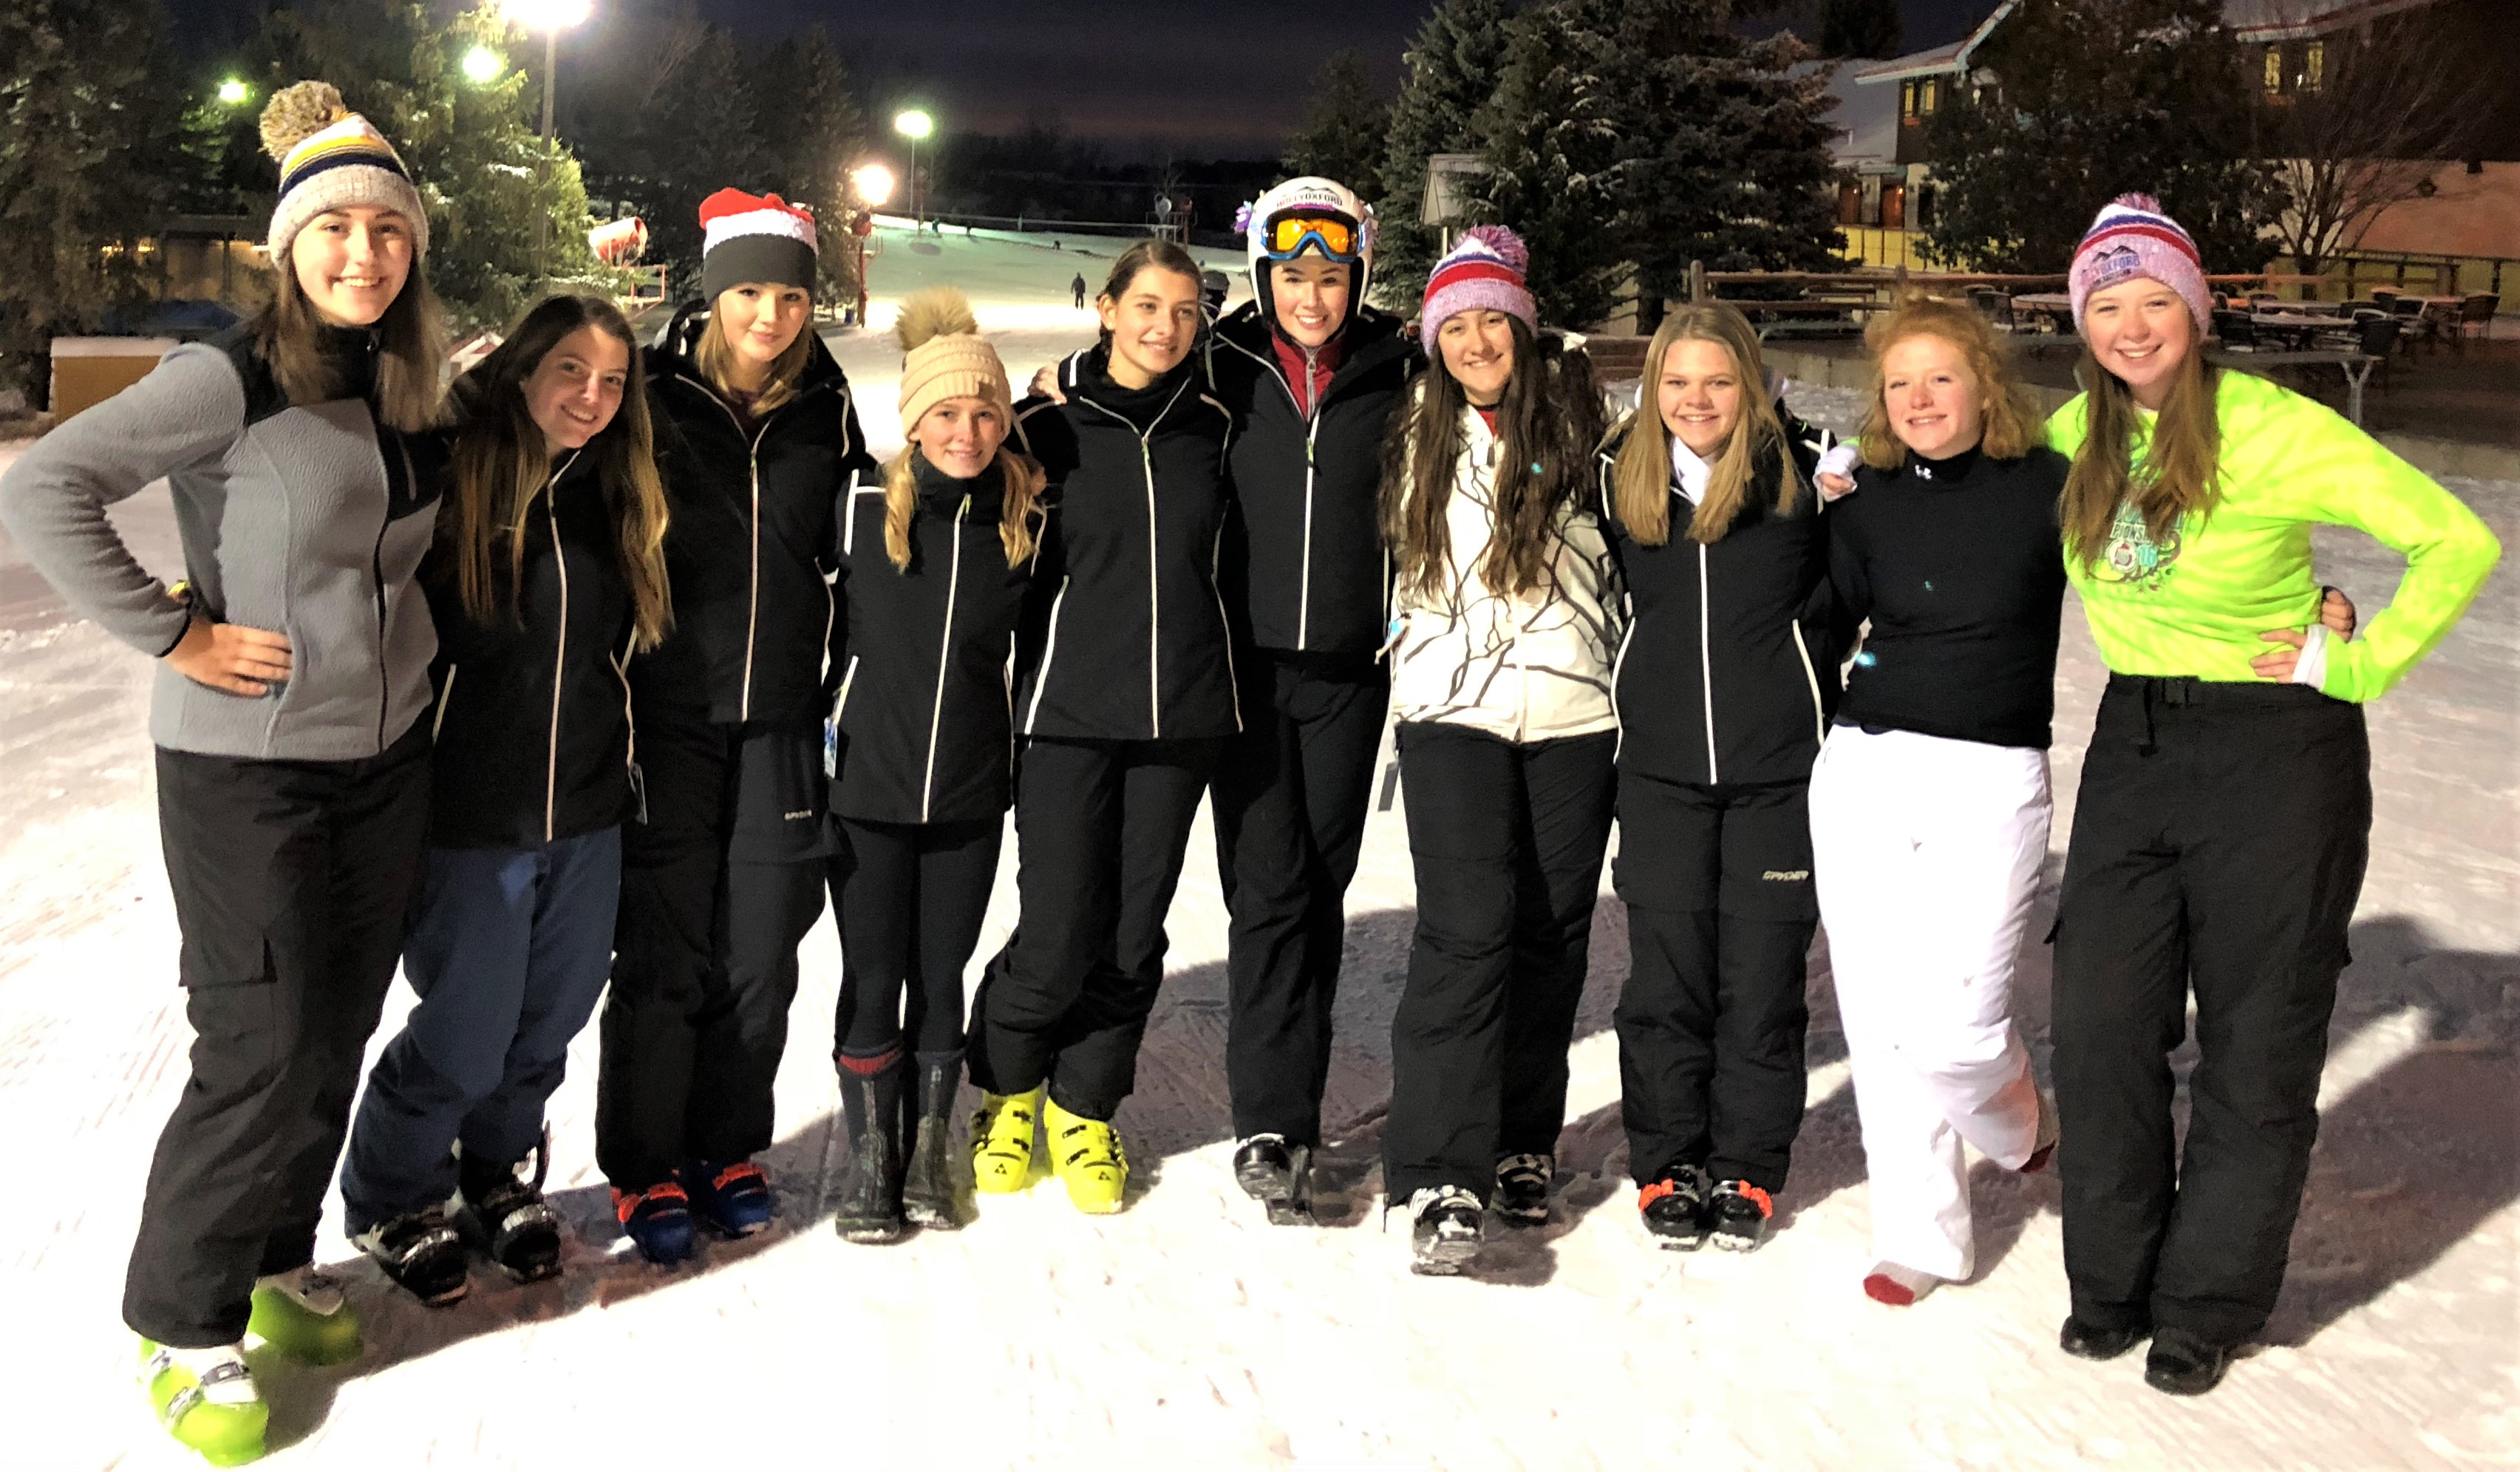 From left, Natalie Morehouse, Melanie Kerbelis, Natalie Nichols, Emma Kerbelis, Marie Contzen, Mackenzie Nichols, Jenna Stepek, Hannah Kwapis, Lauran Mauser and Renee Johnston. Photo provided.